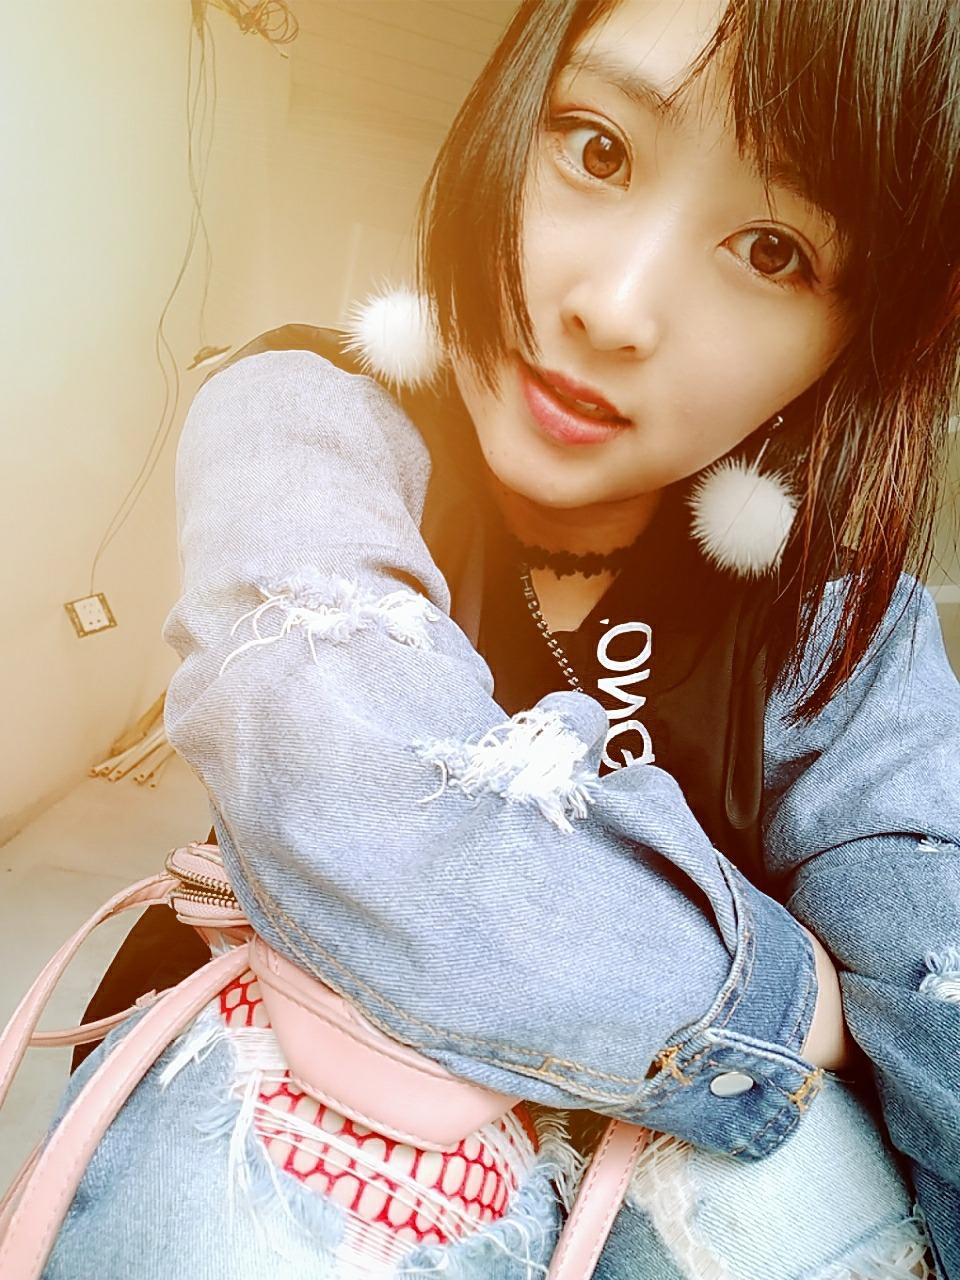 SelfieCity_20180520144243_save_mr1526798690643.jpg